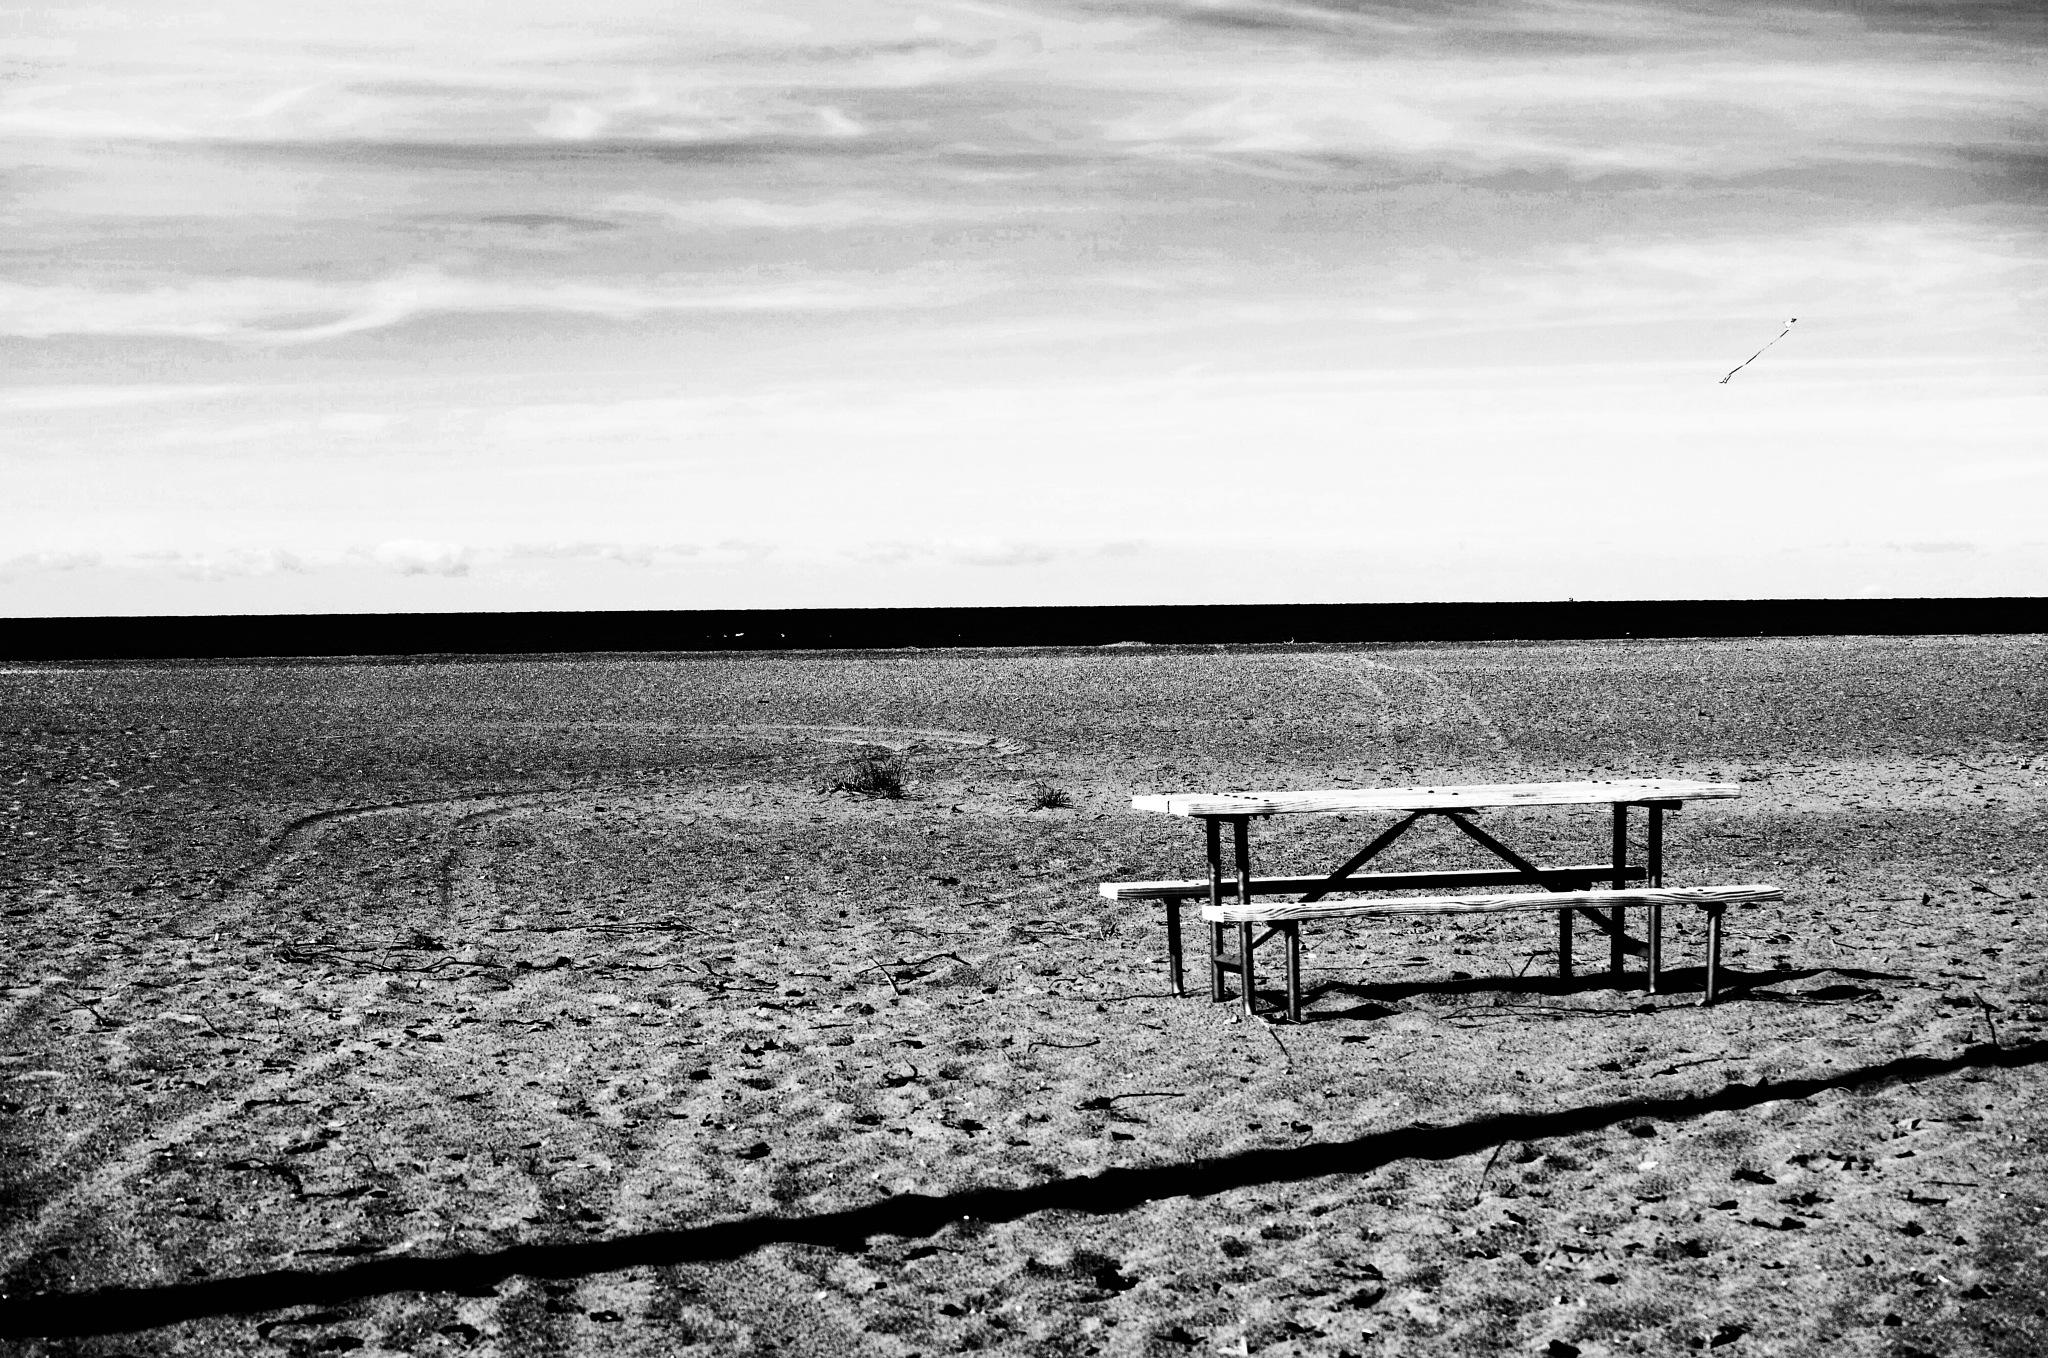 Desolate by AMZ